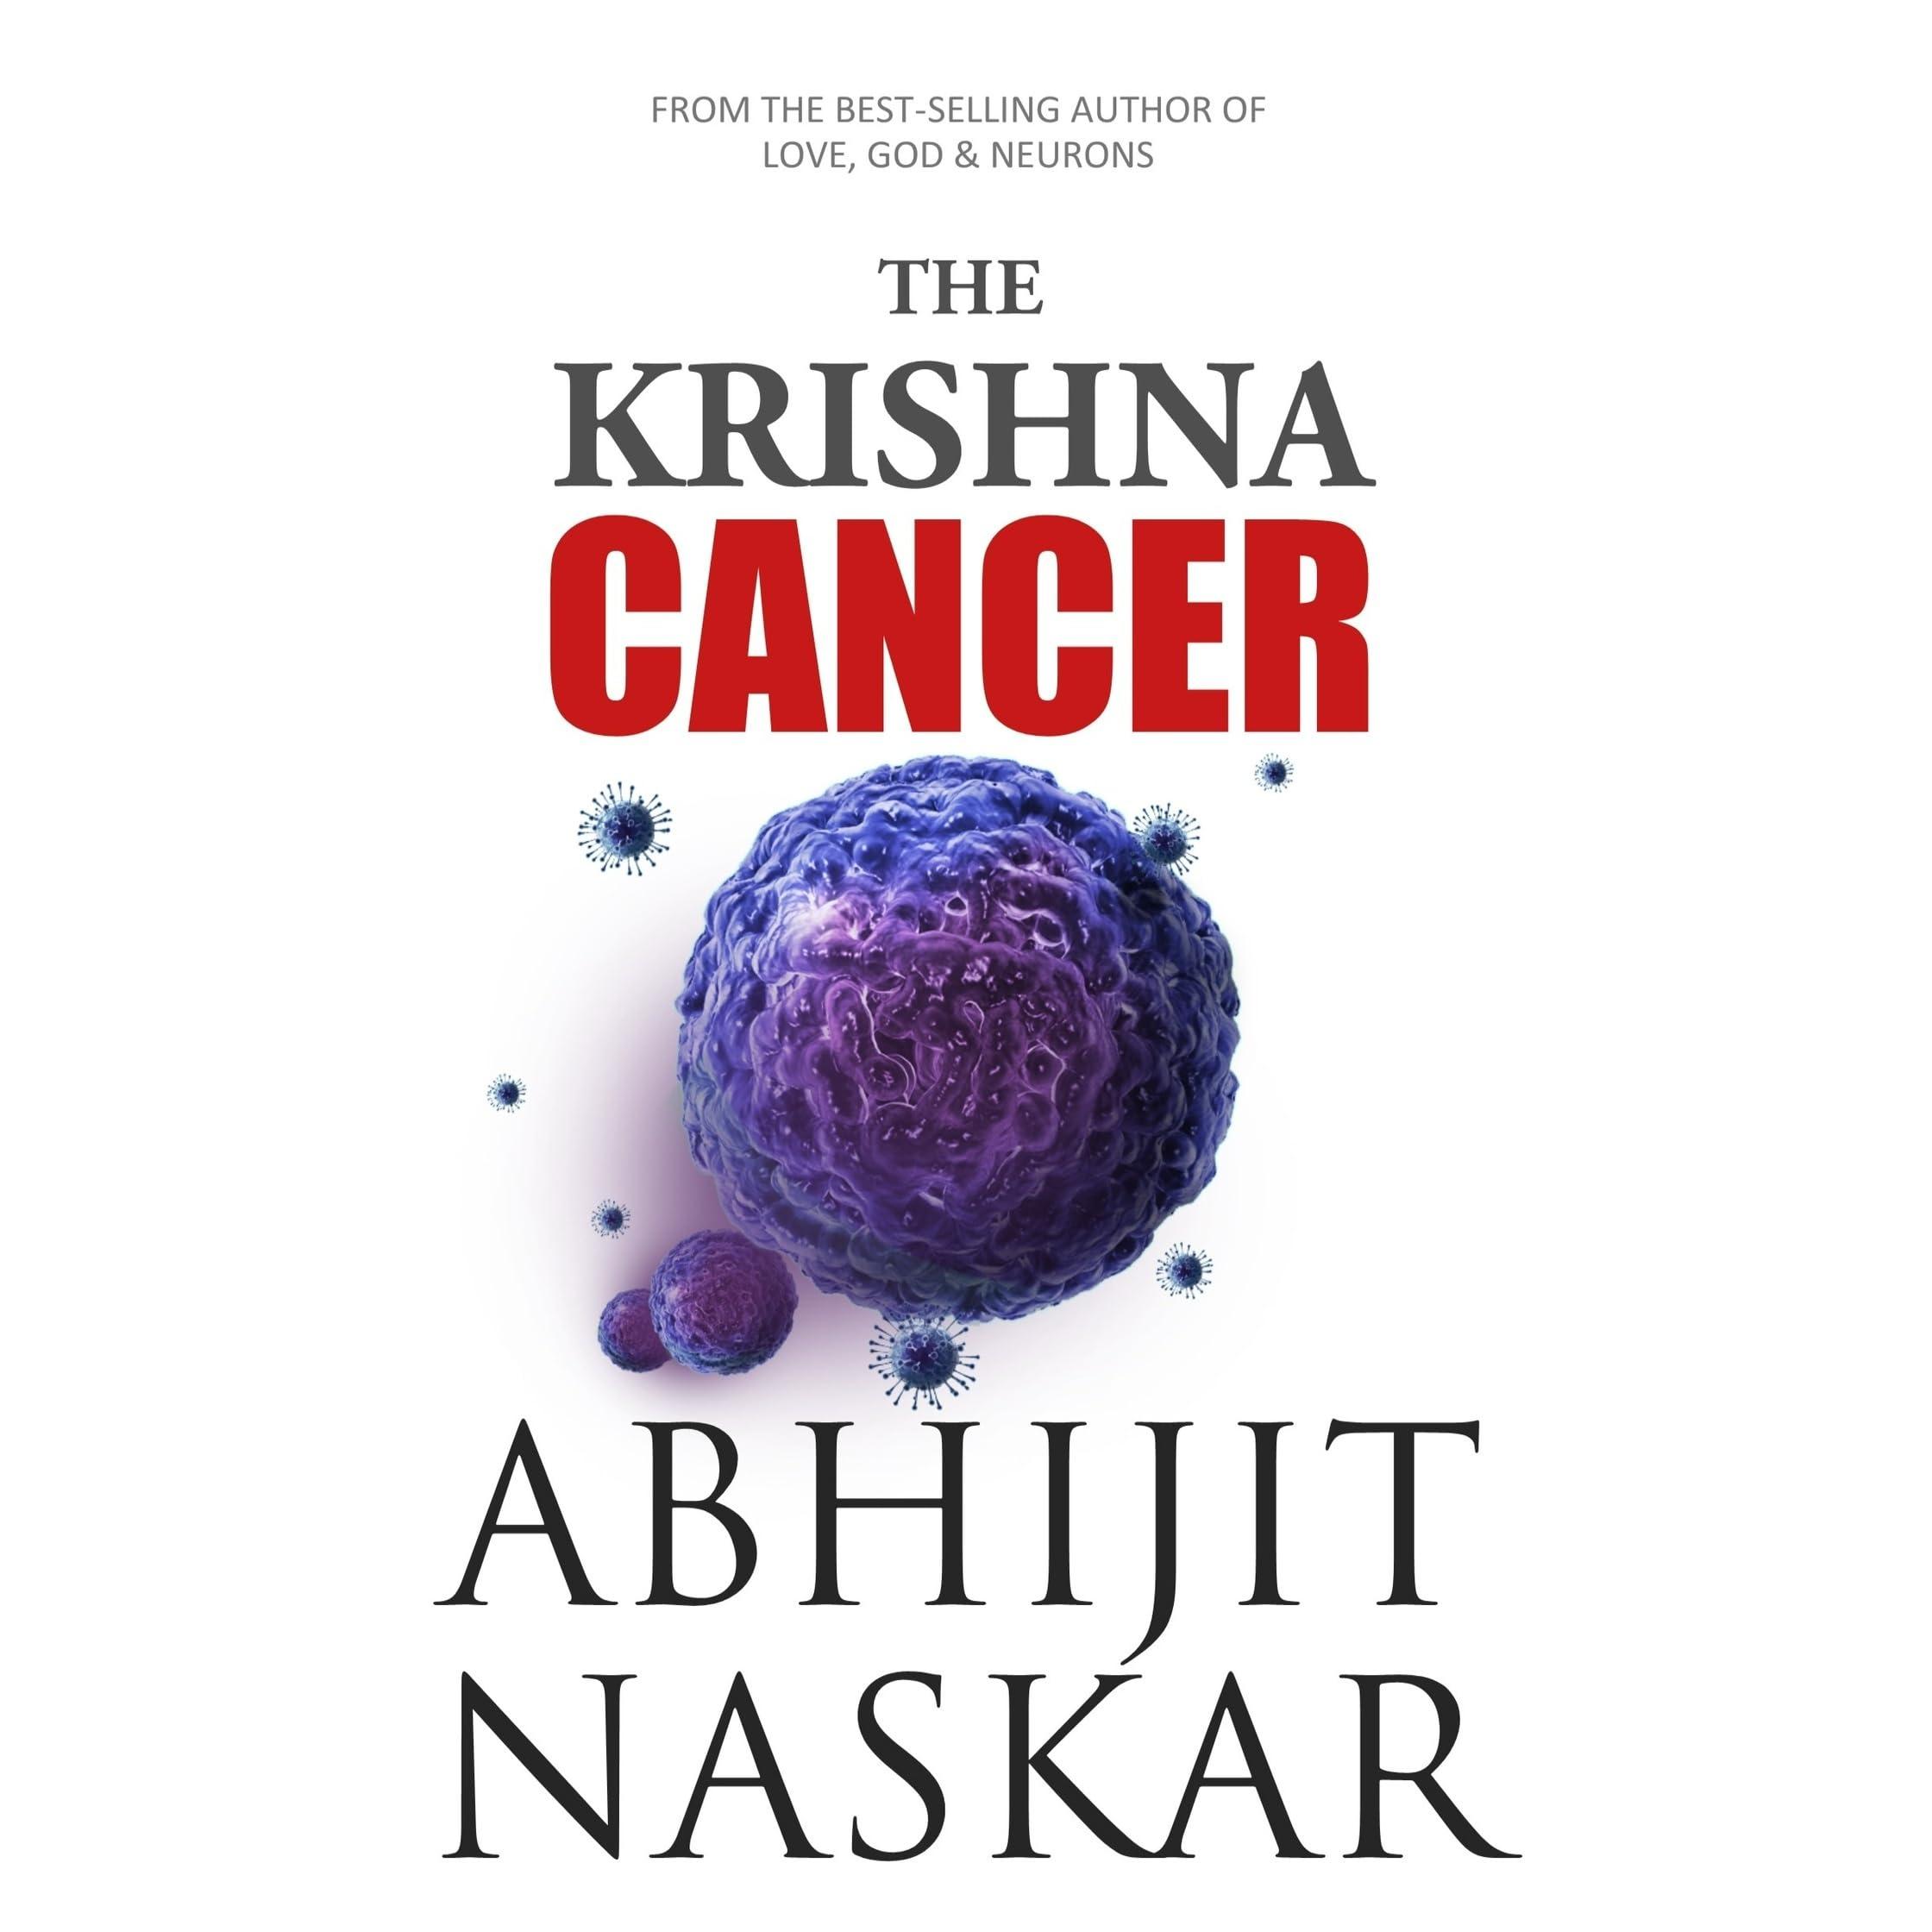 The Krishna Cancer By Abhijit Naskar